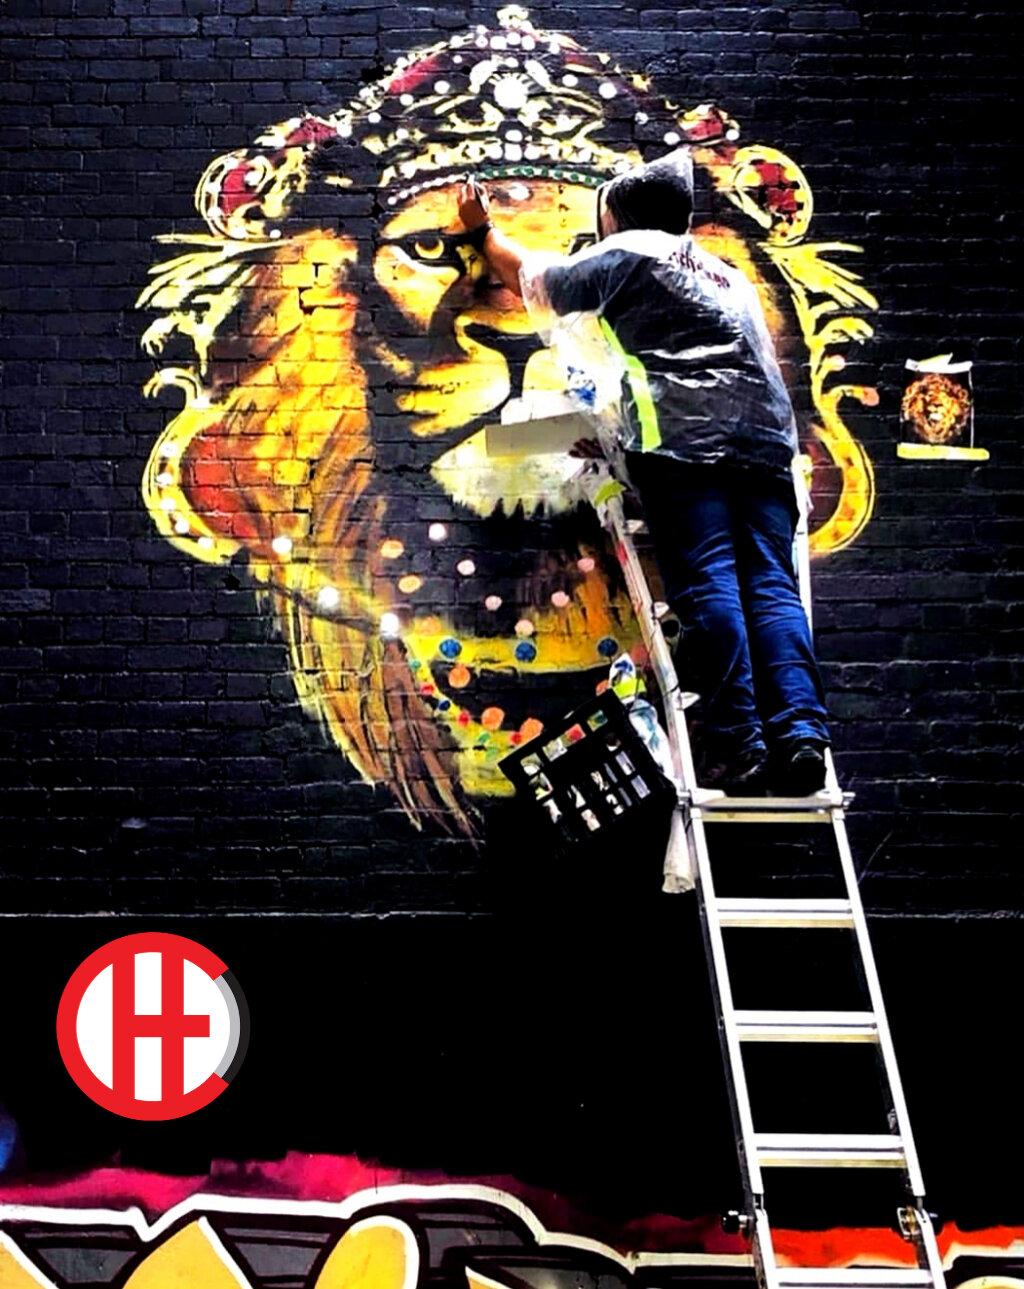 Mural Painters LA mural Artist Muralist Street Artist Wall MURALS  LA Vivache Designs.jpg